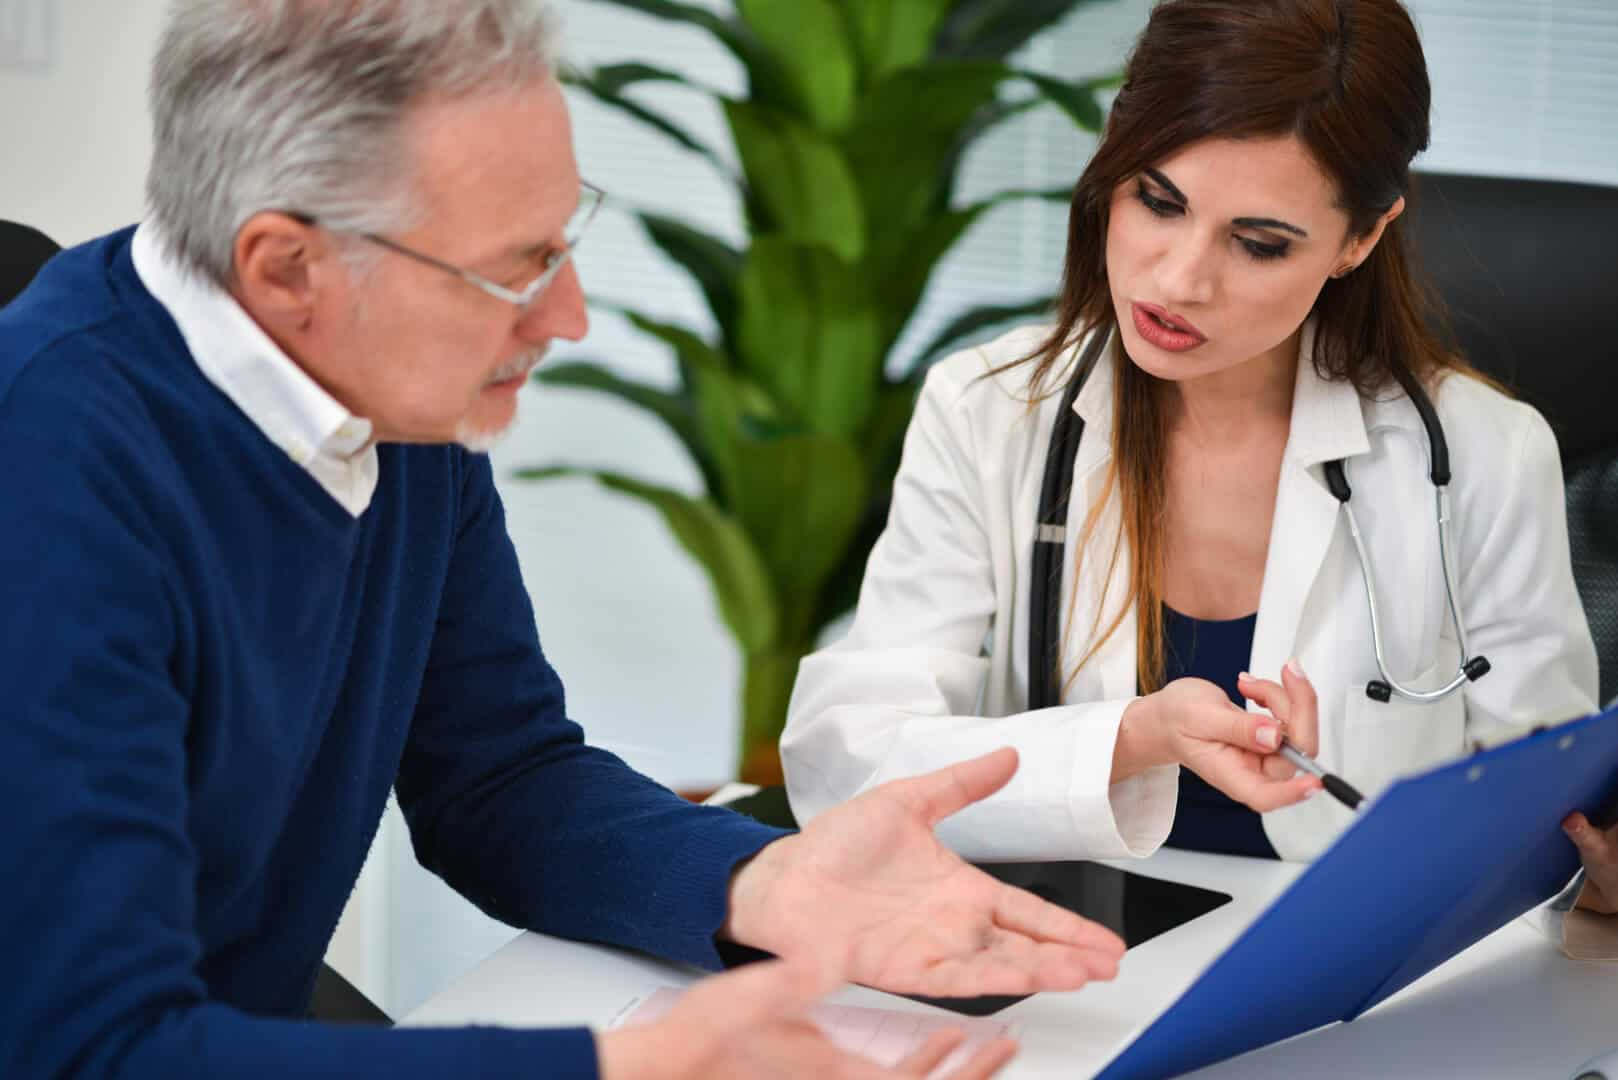 Internal Medicine ABIM - Study Test Review - Exam Master